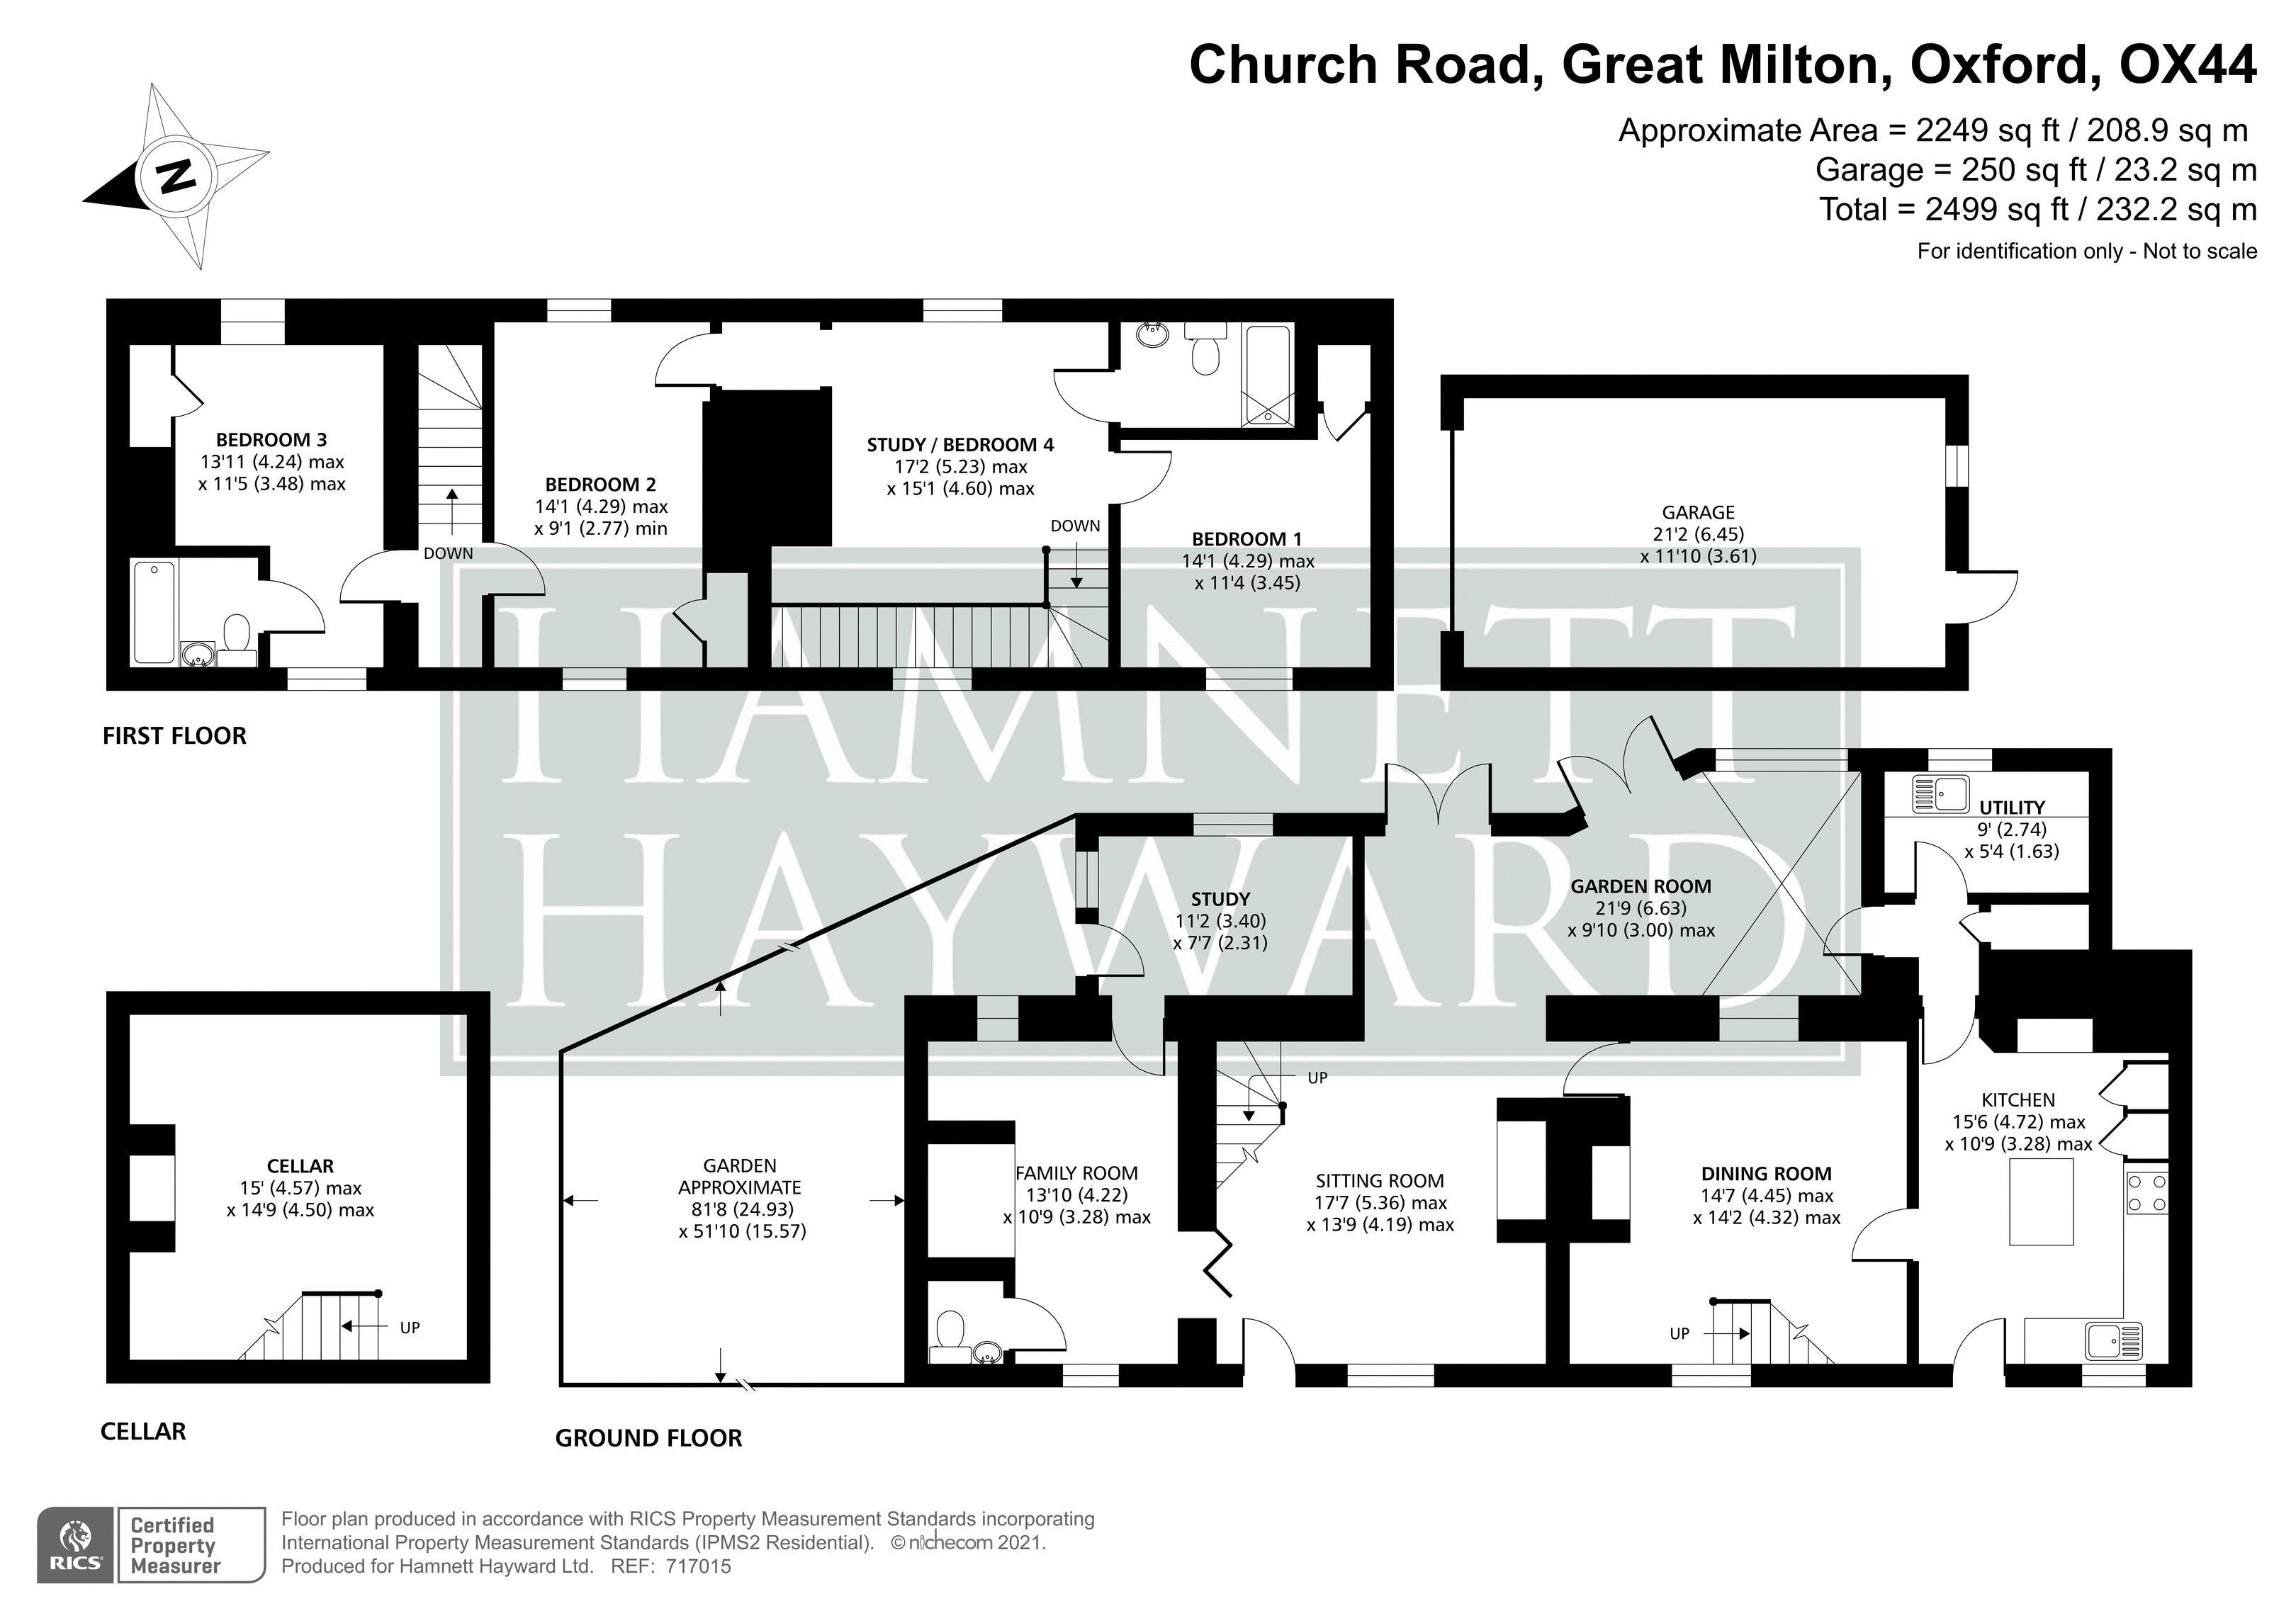 Church Road Great Milton